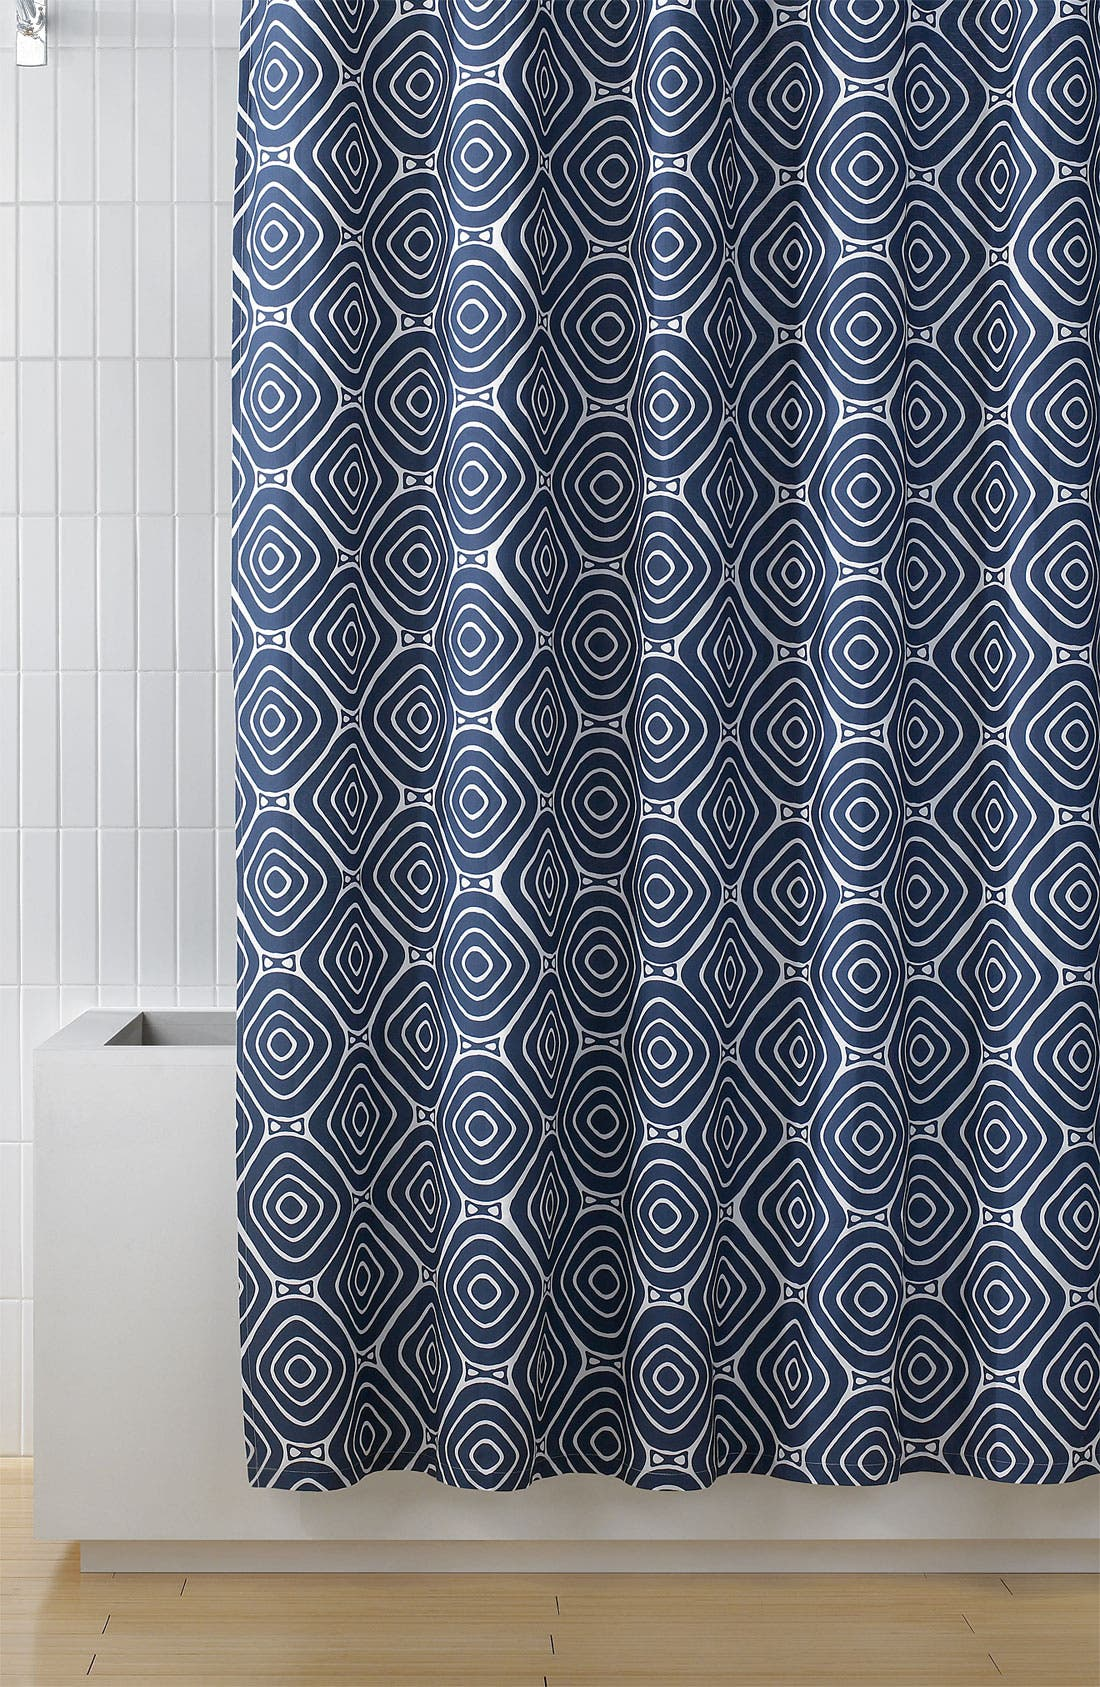 Alternate Image 1 Selected - Diane von Furstenberg 'Geo Square' Shower Curtain